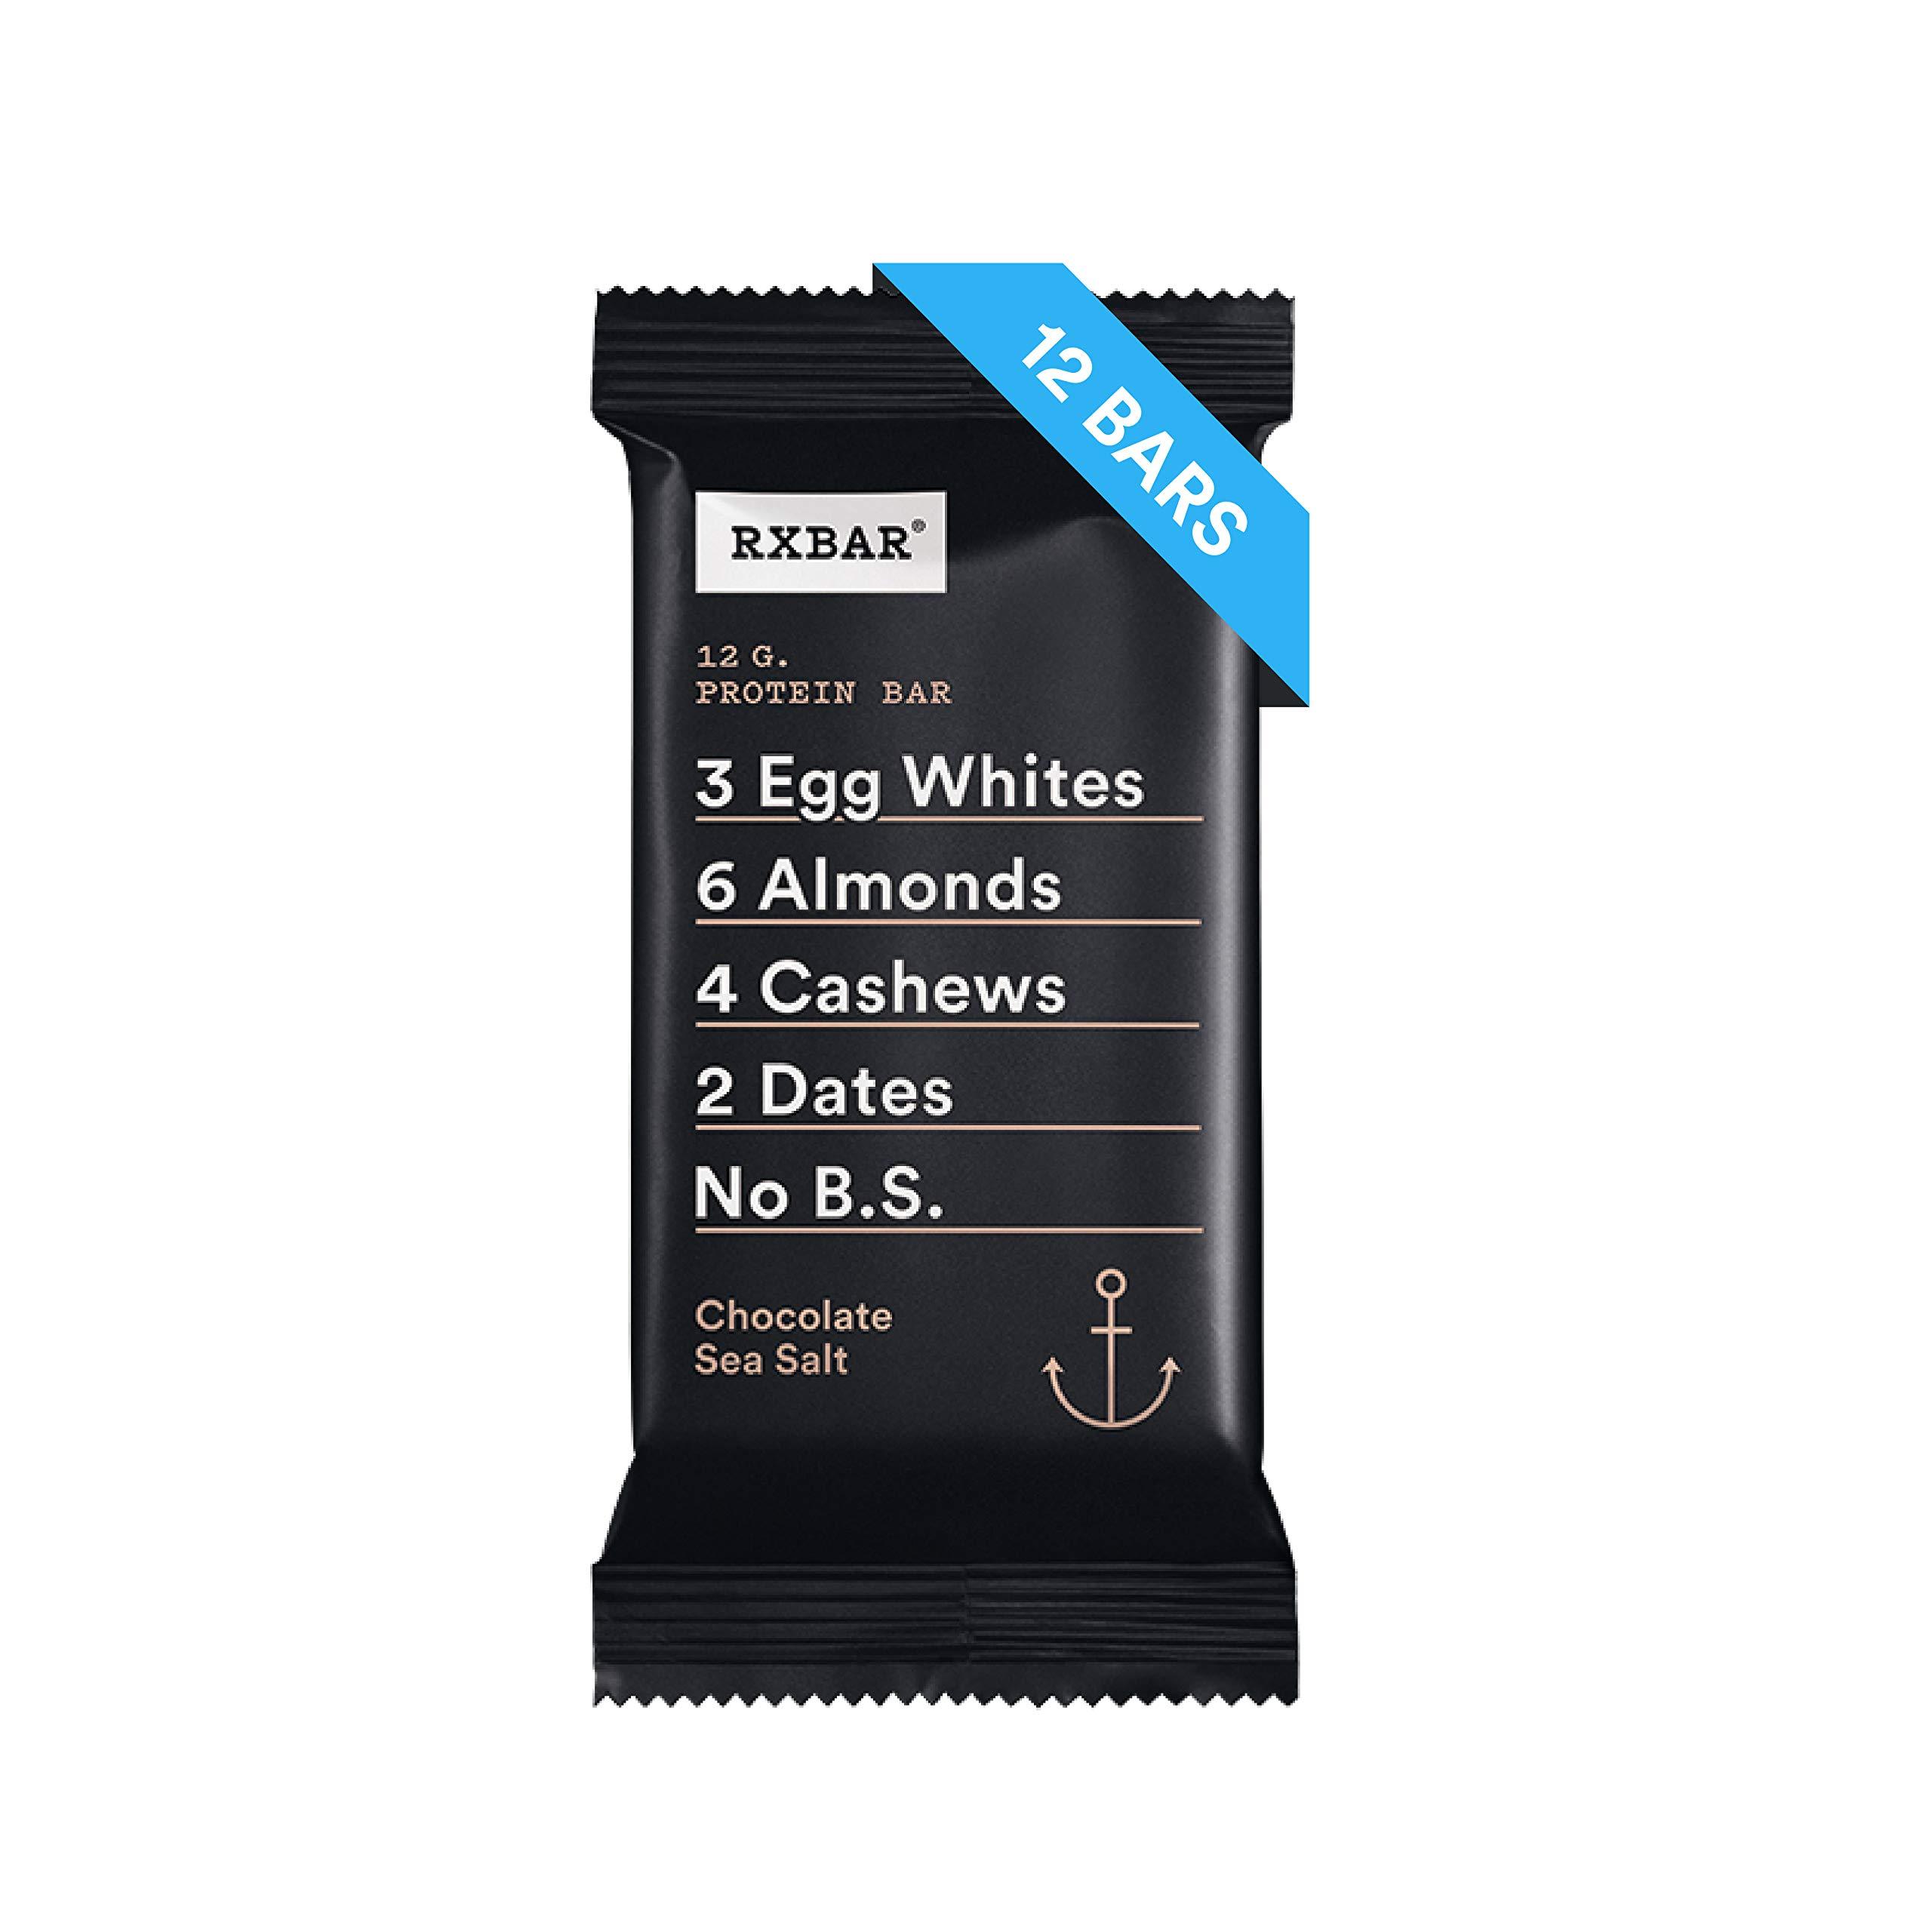 RXBAR, Chocolate Sea Salt, Protein Bar, 1.83 Ounce (Pack of 12) Breakfast Bar, High Protein Snack by RXBAR